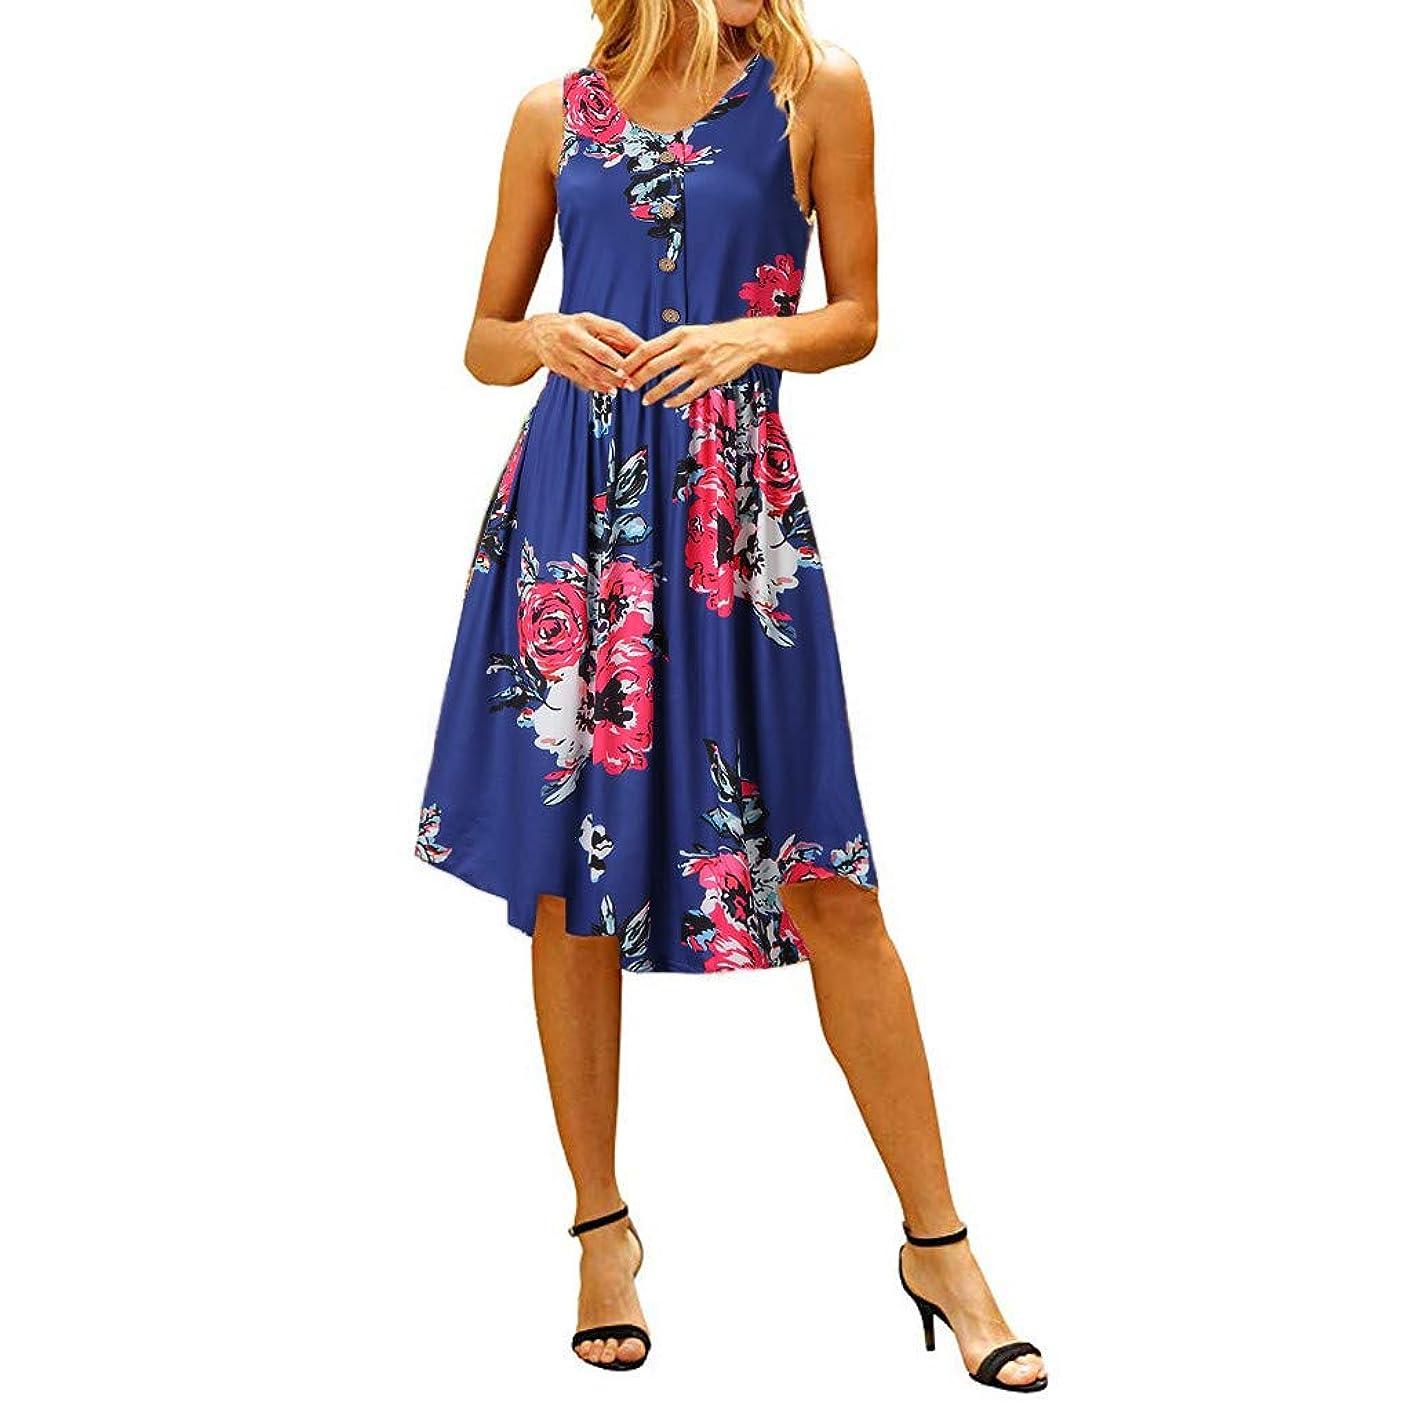 Big Sale,Yetou?Women's Summer Vintage Floral Print Fashion Sleeveless Dress Casual Print Crew Neck Dres